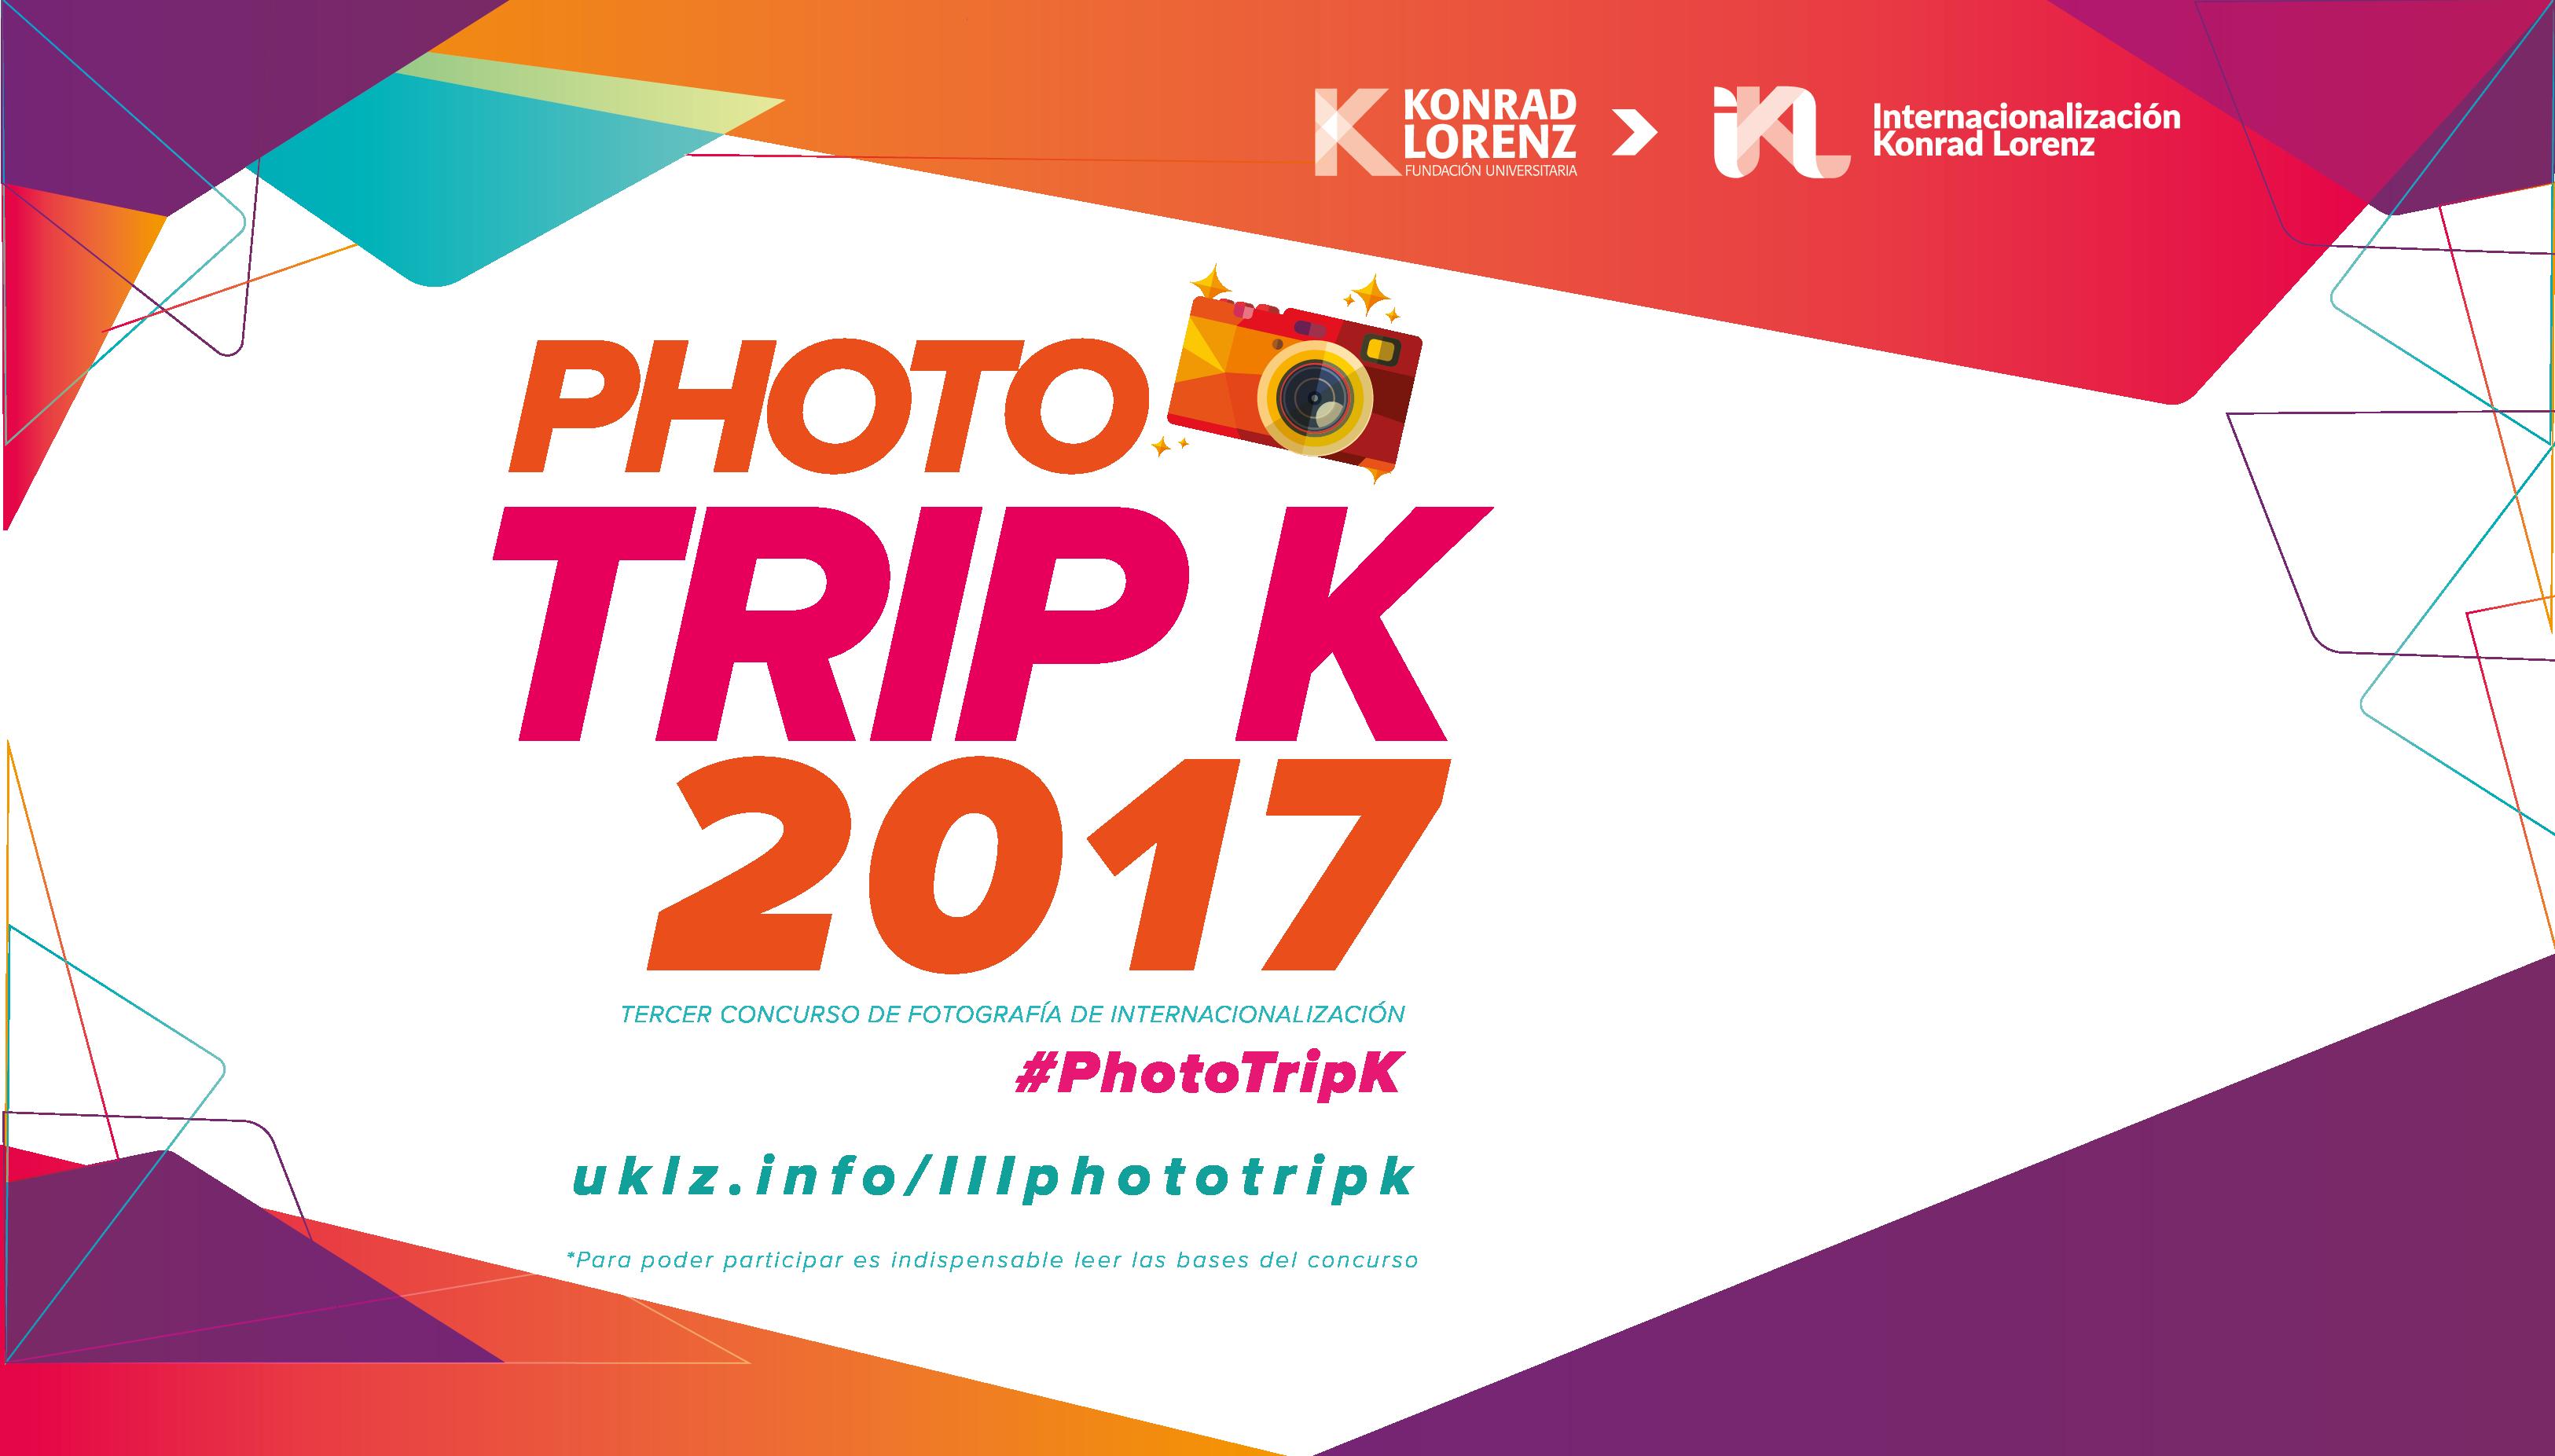 Photo Trip-K 2017